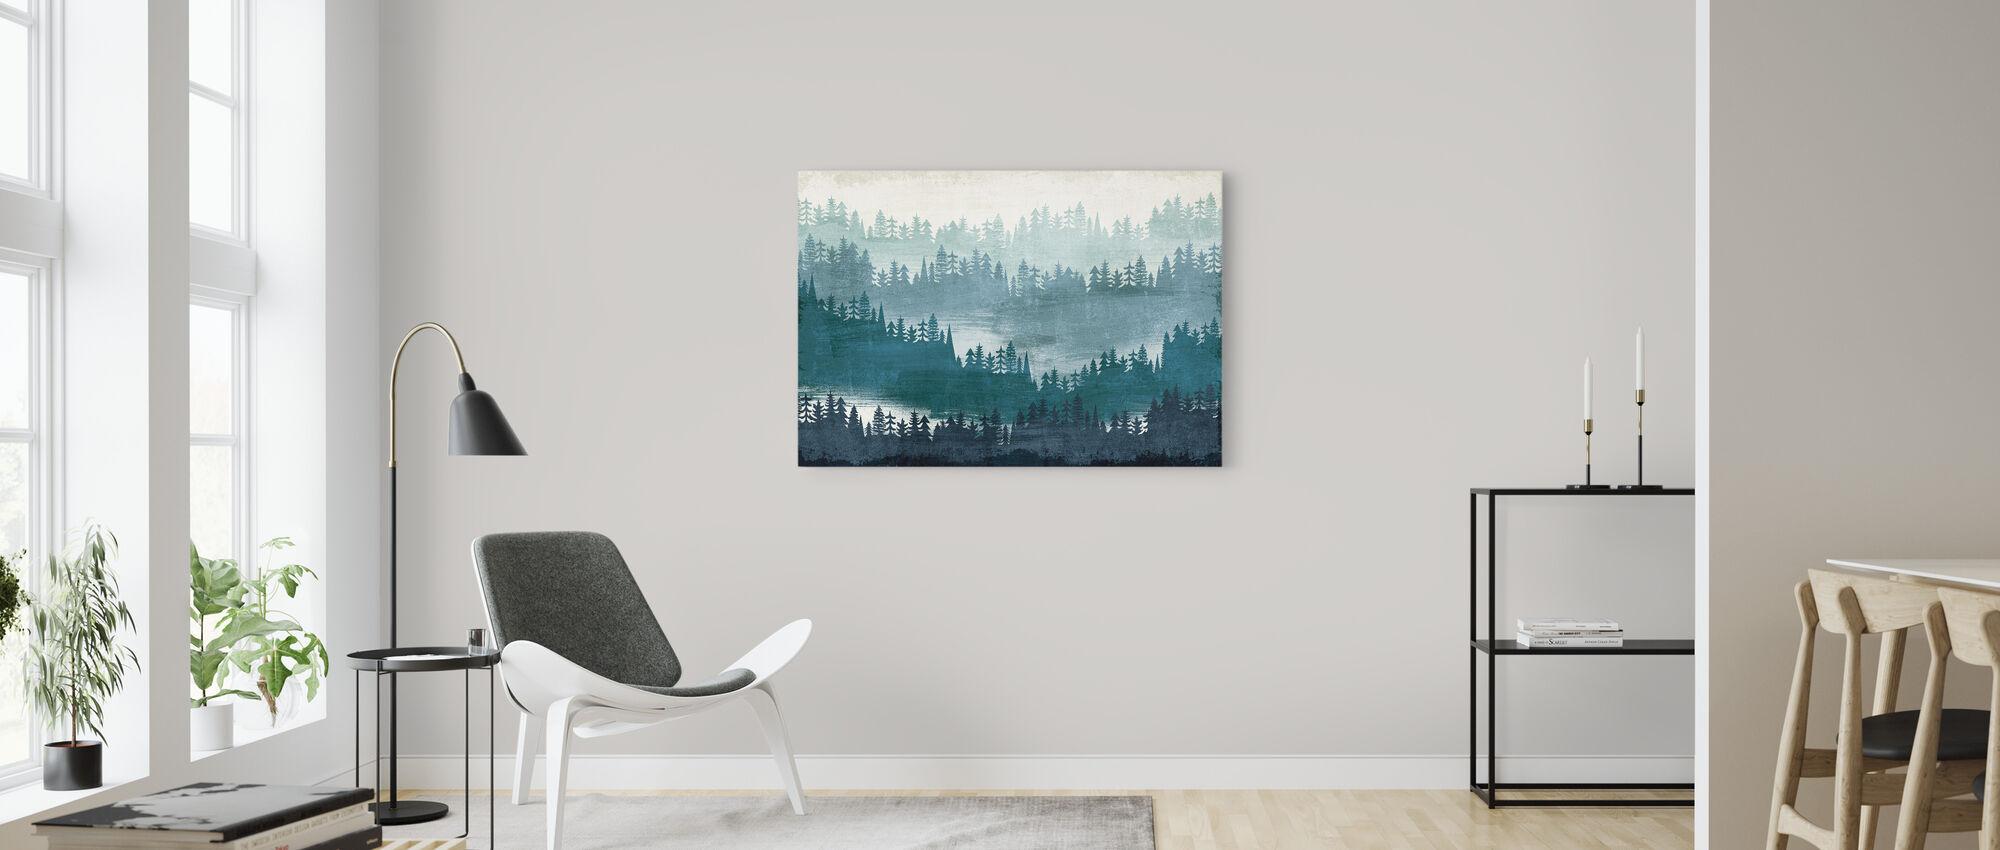 Mountainscape Blue - Canvas print - Living Room